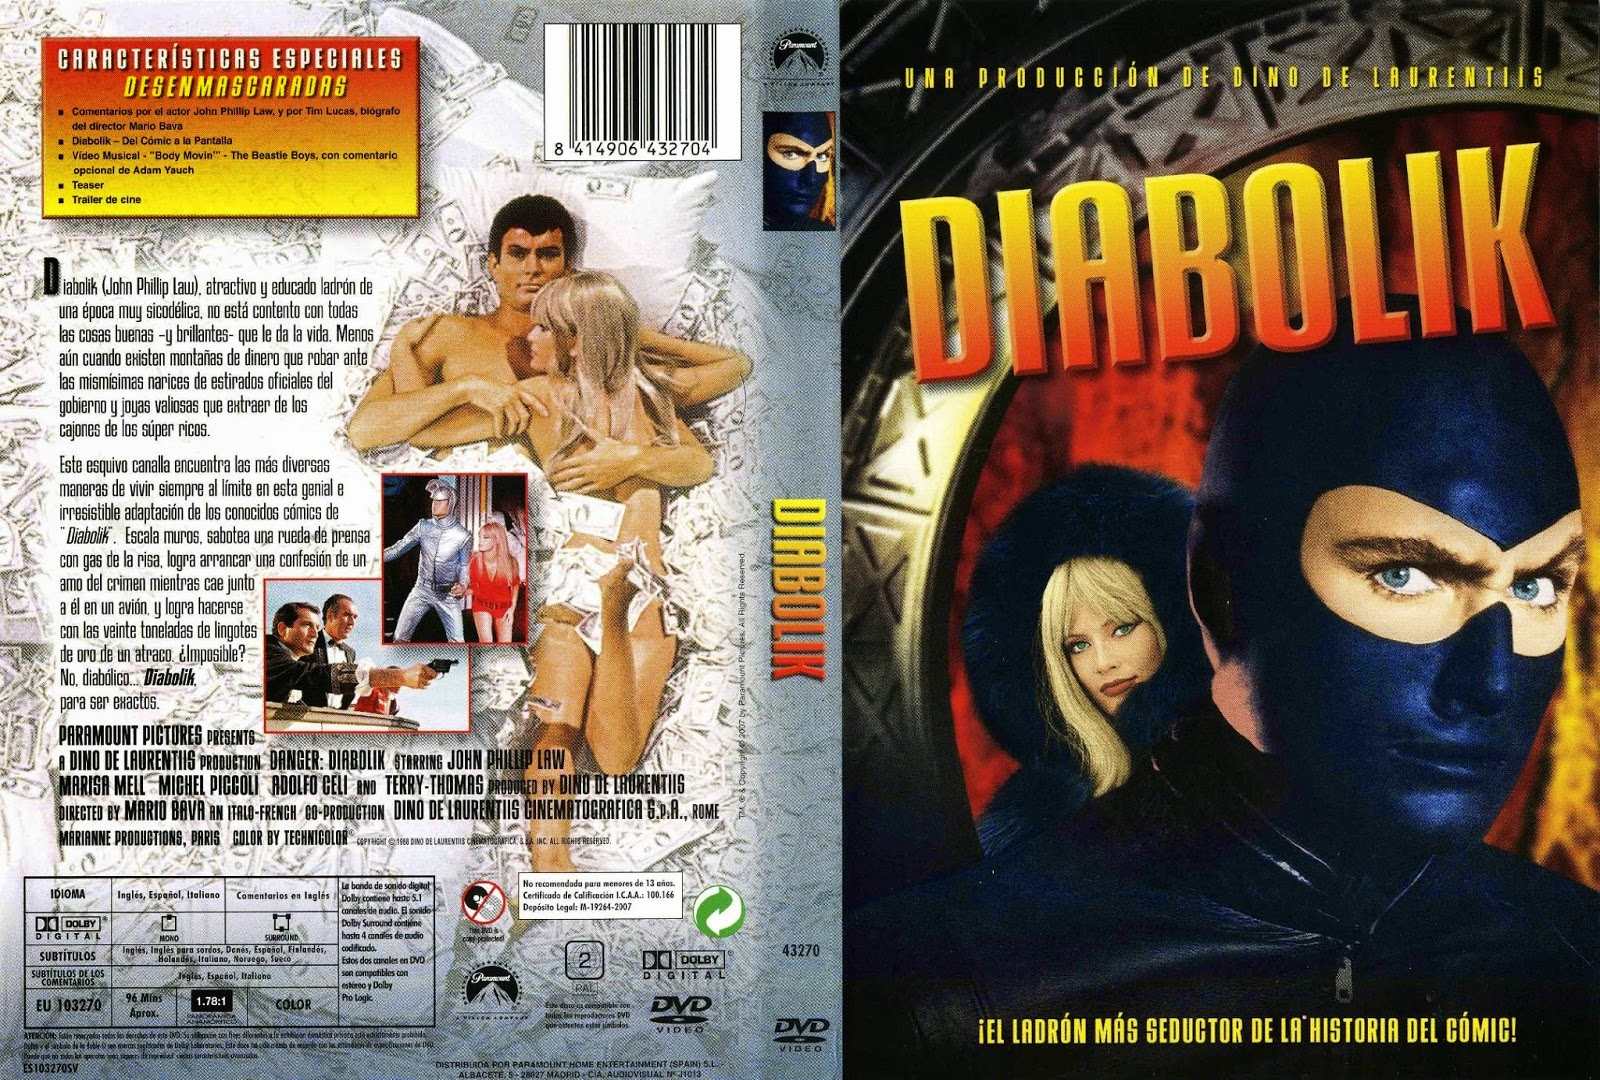 Diabolik (Danger: Diabolik - 1968)